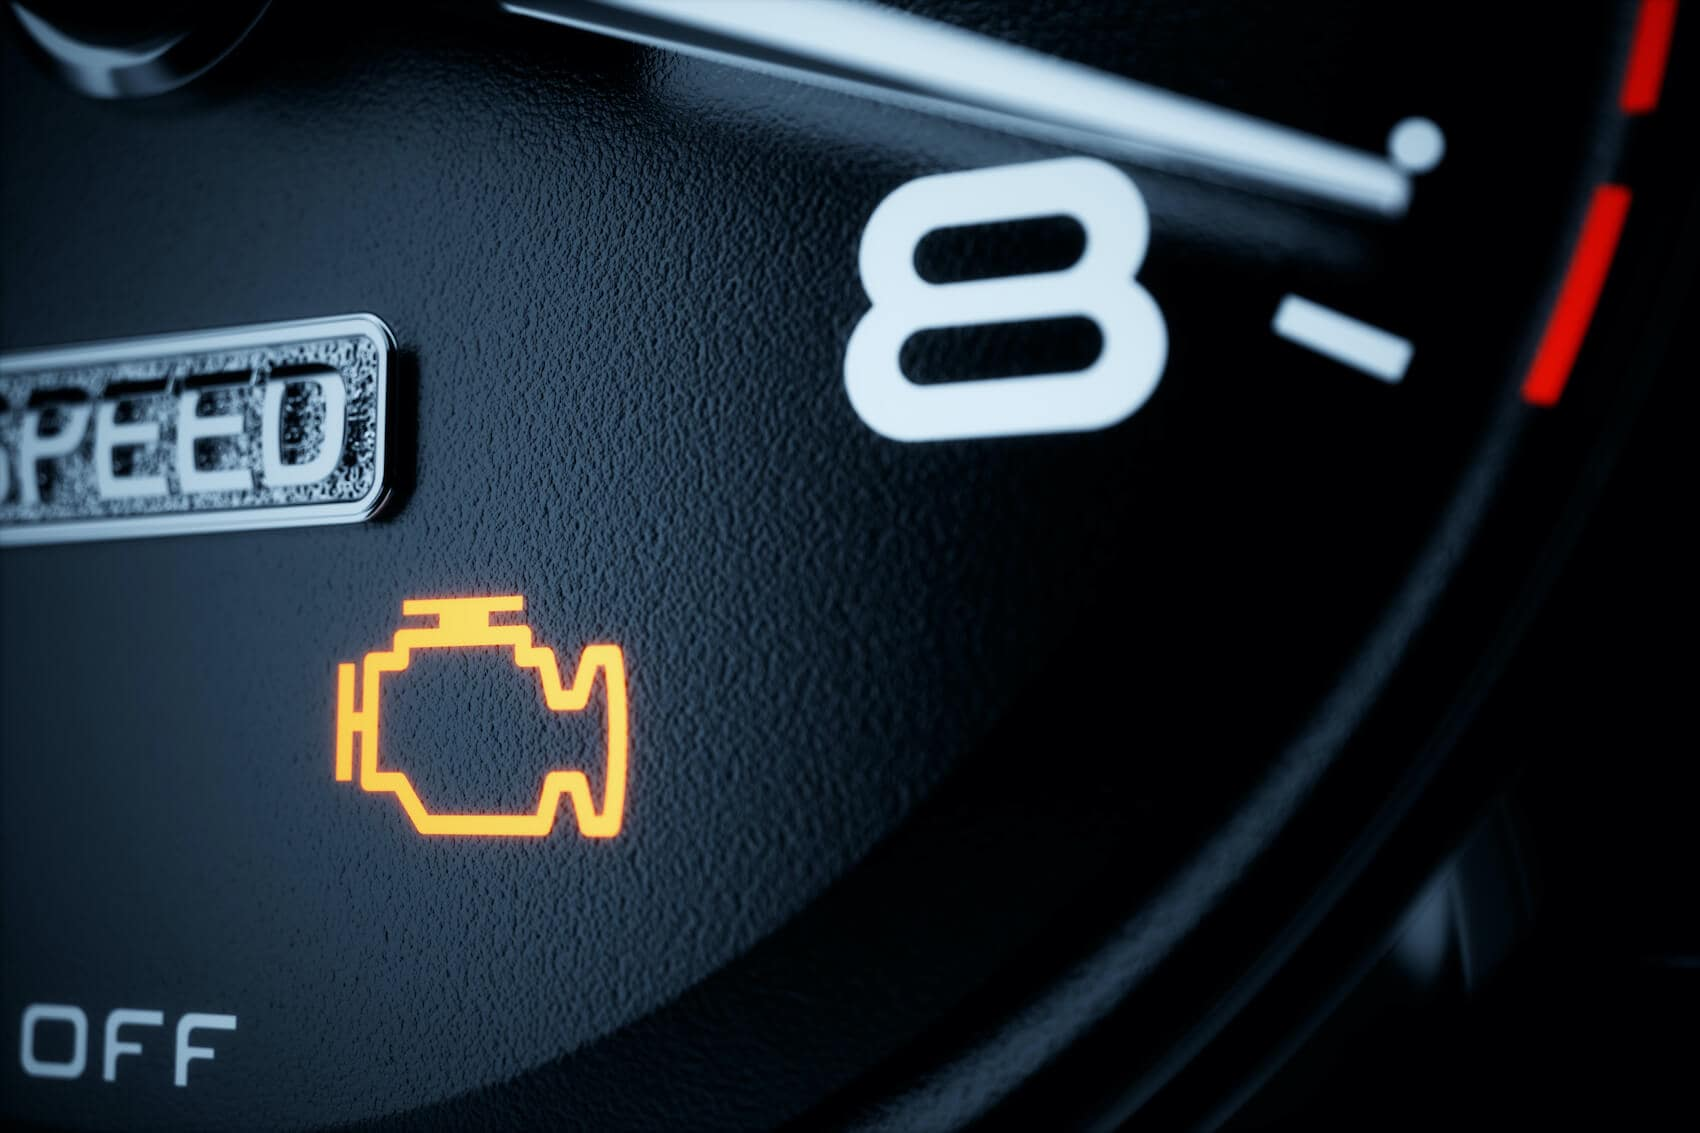 The Honda B1 Service Light and Maintenance Minder System